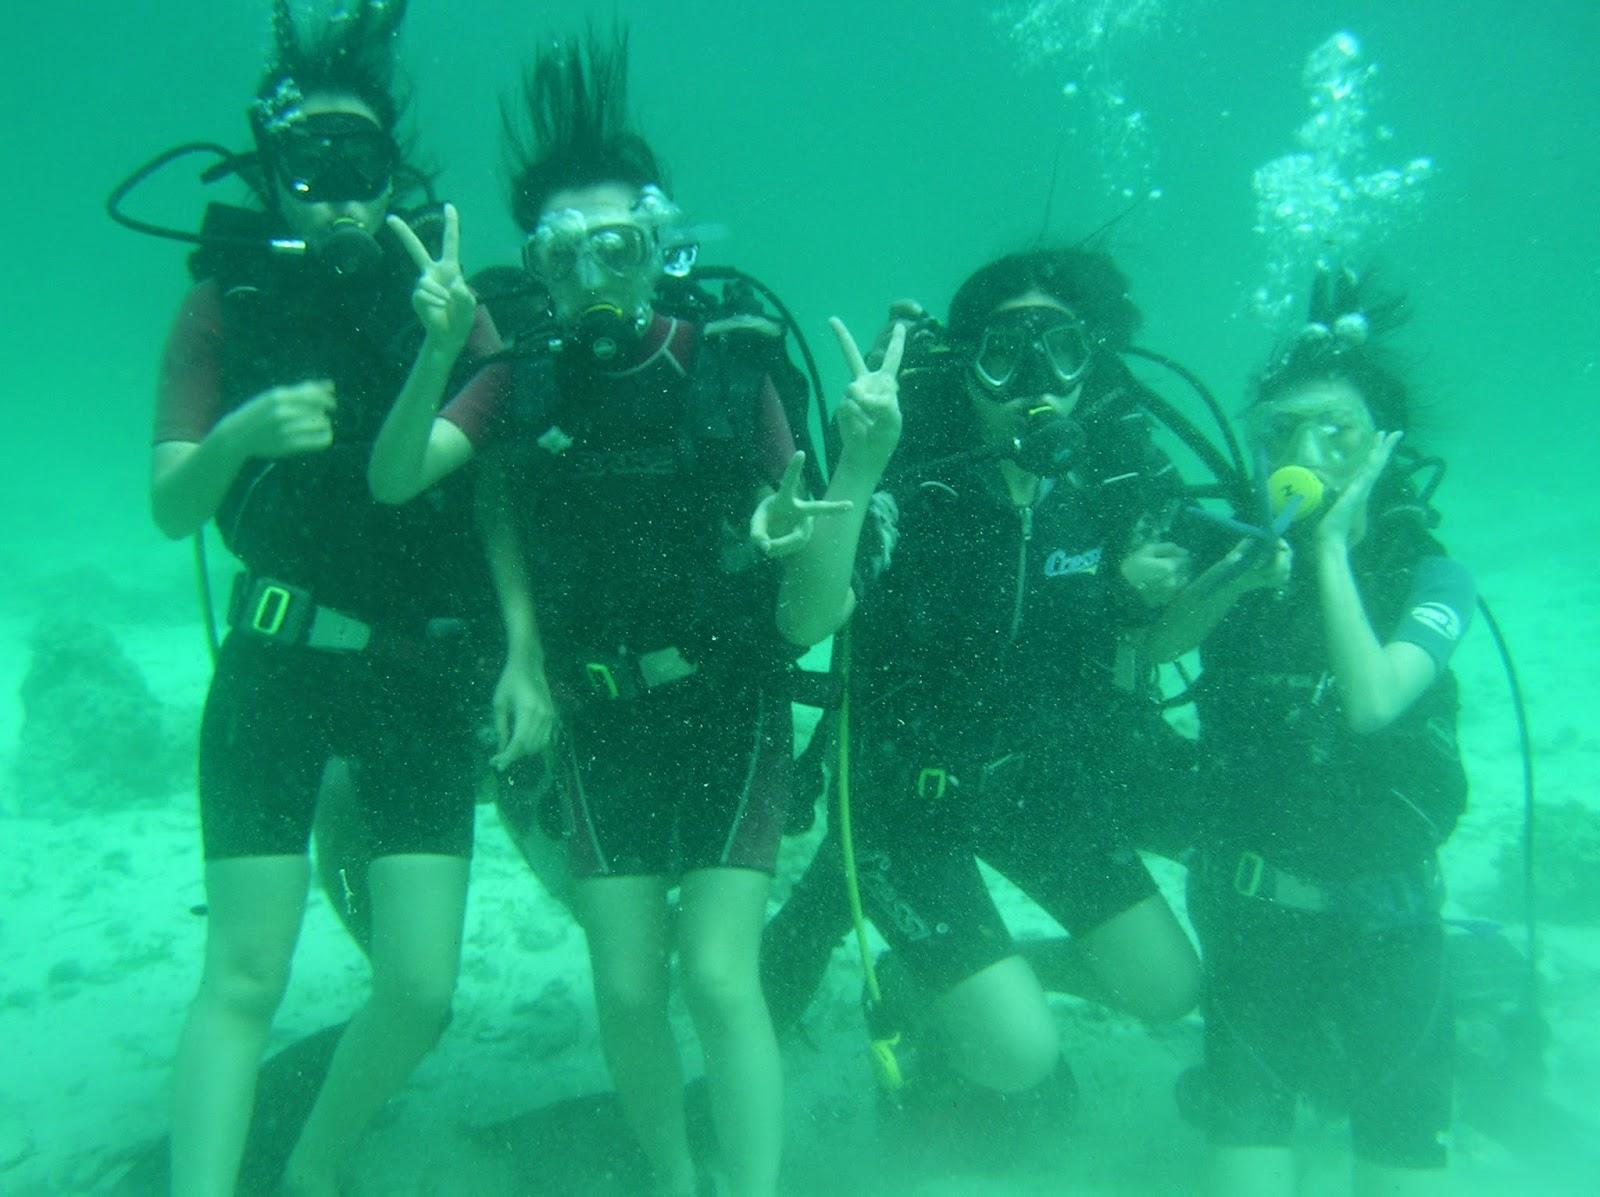 Study English School In Cebu Philippines Smeag